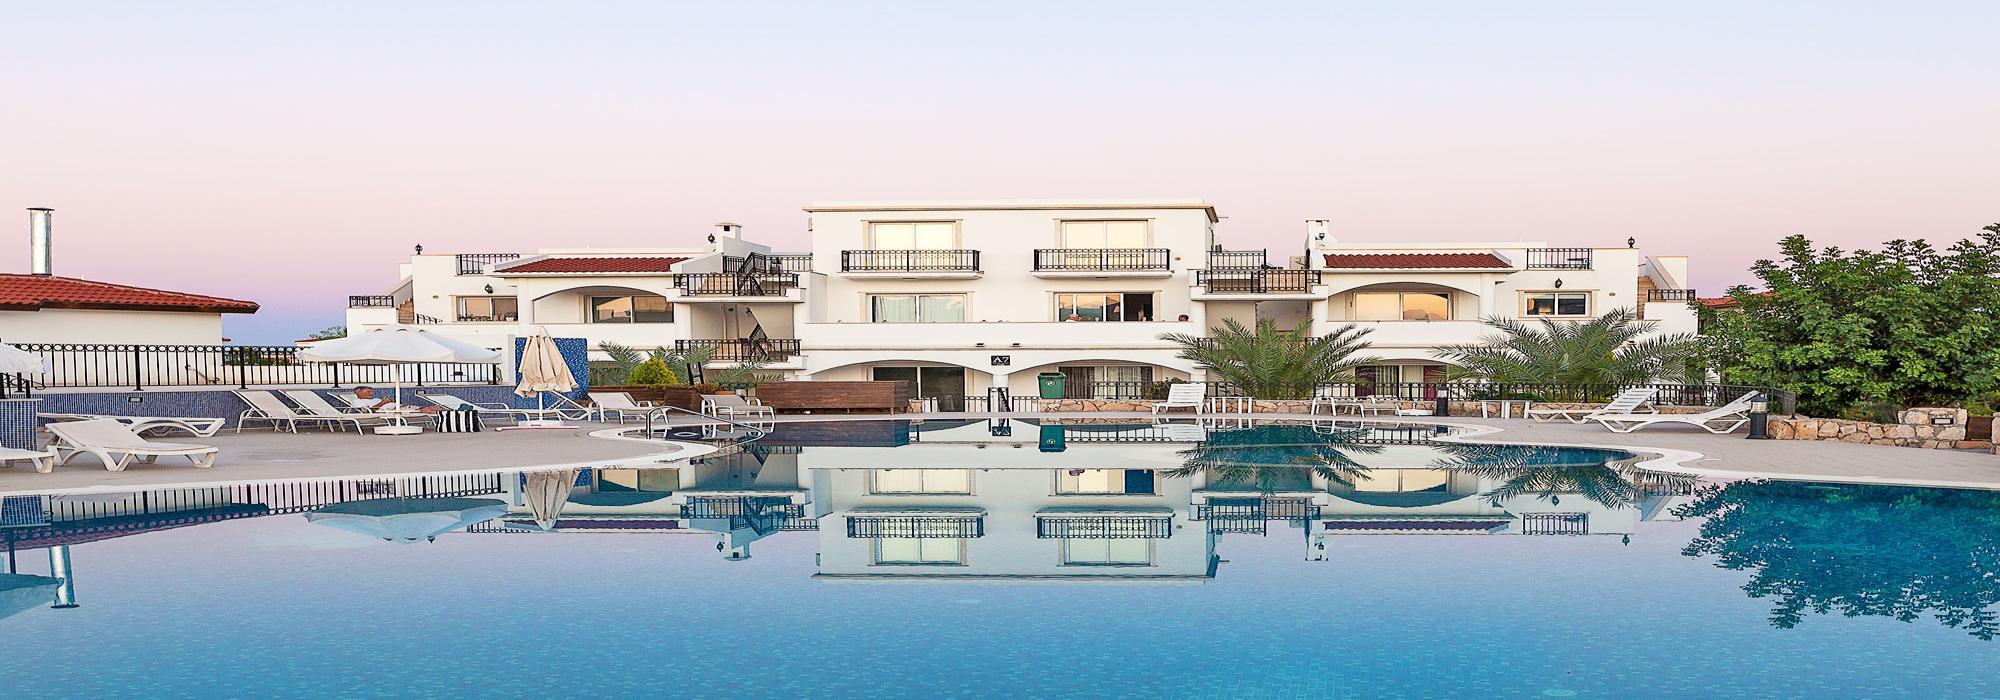 Elegant 2 Bedroom Apartment For Rent Location Esentepe Girne